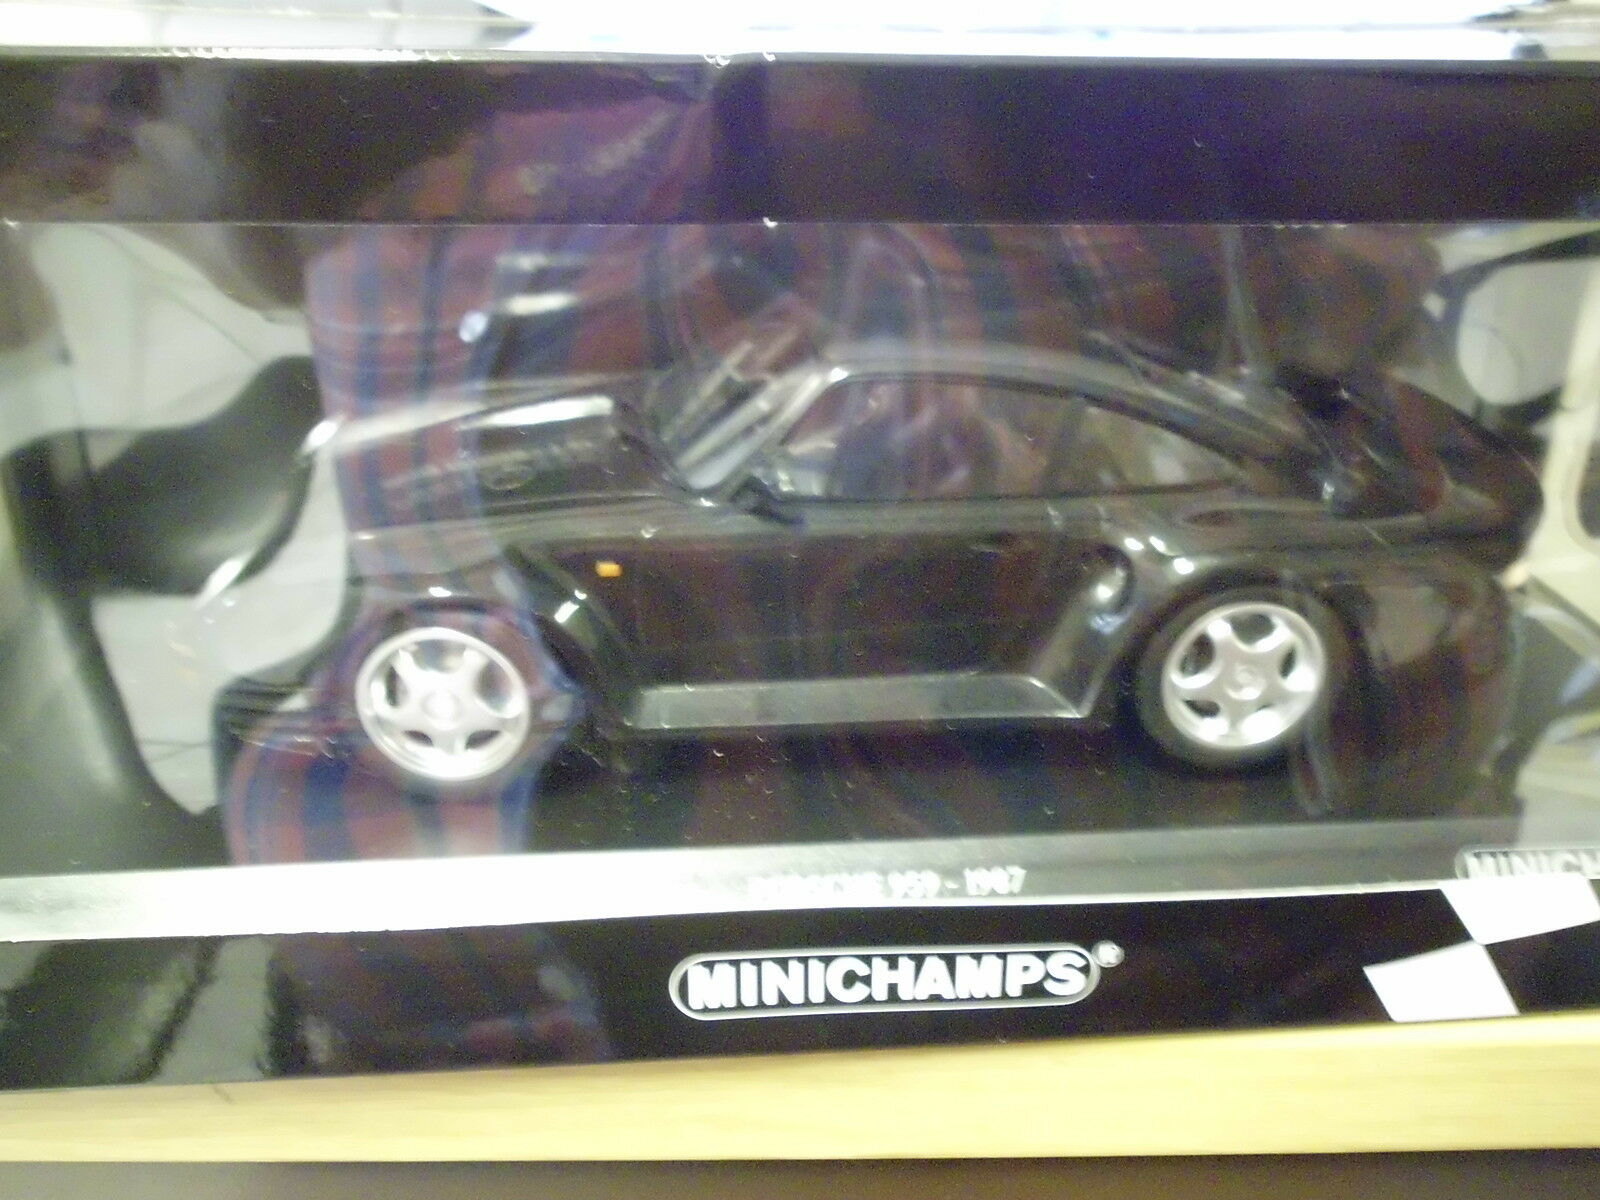 centro comercial de moda Minichamps 155066205 1 18 Porsche 959 1987 1987 1987 gris metalizado nuevo embalaje original  compra en línea hoy